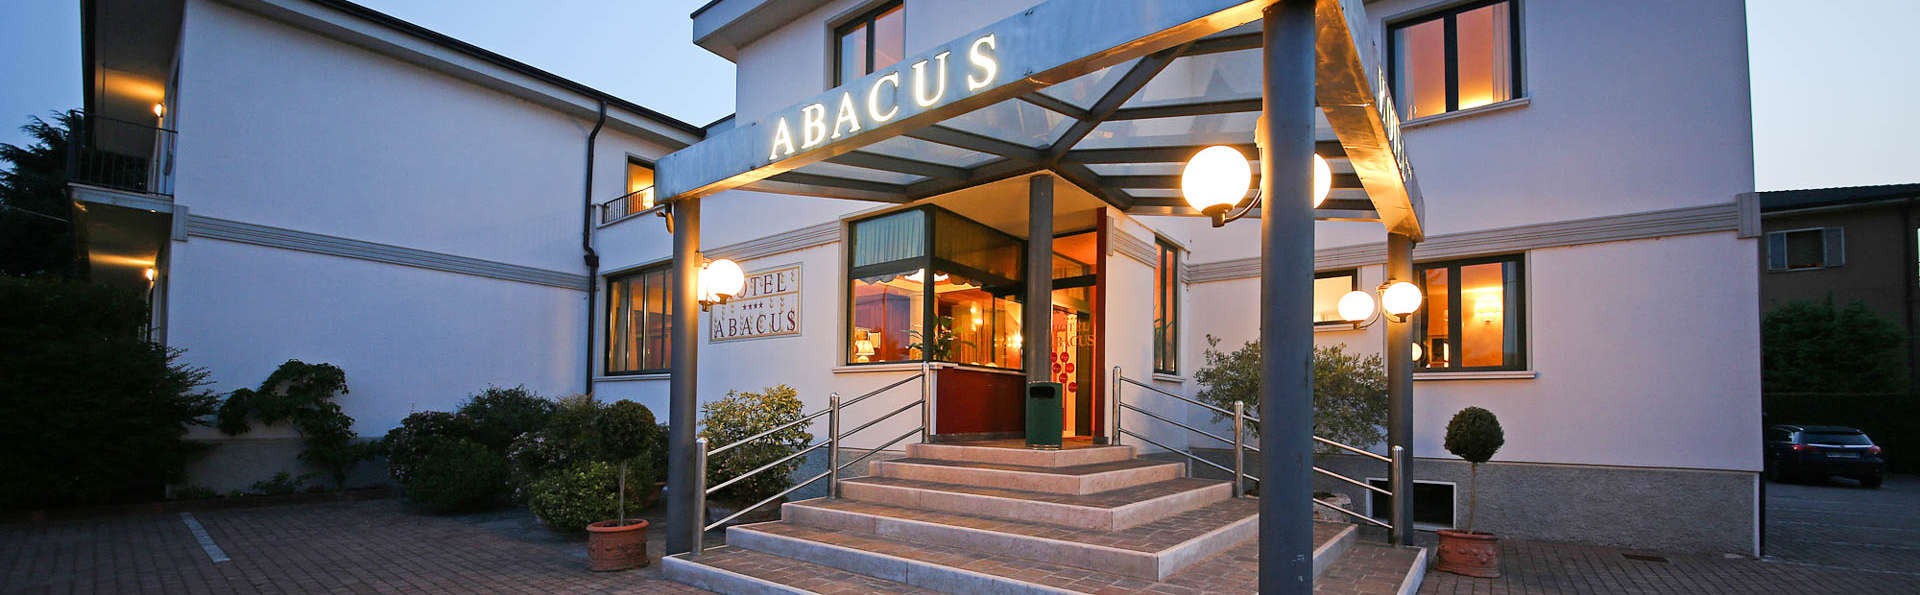 Hotel Abacus - EDIT_FRONT.jpg